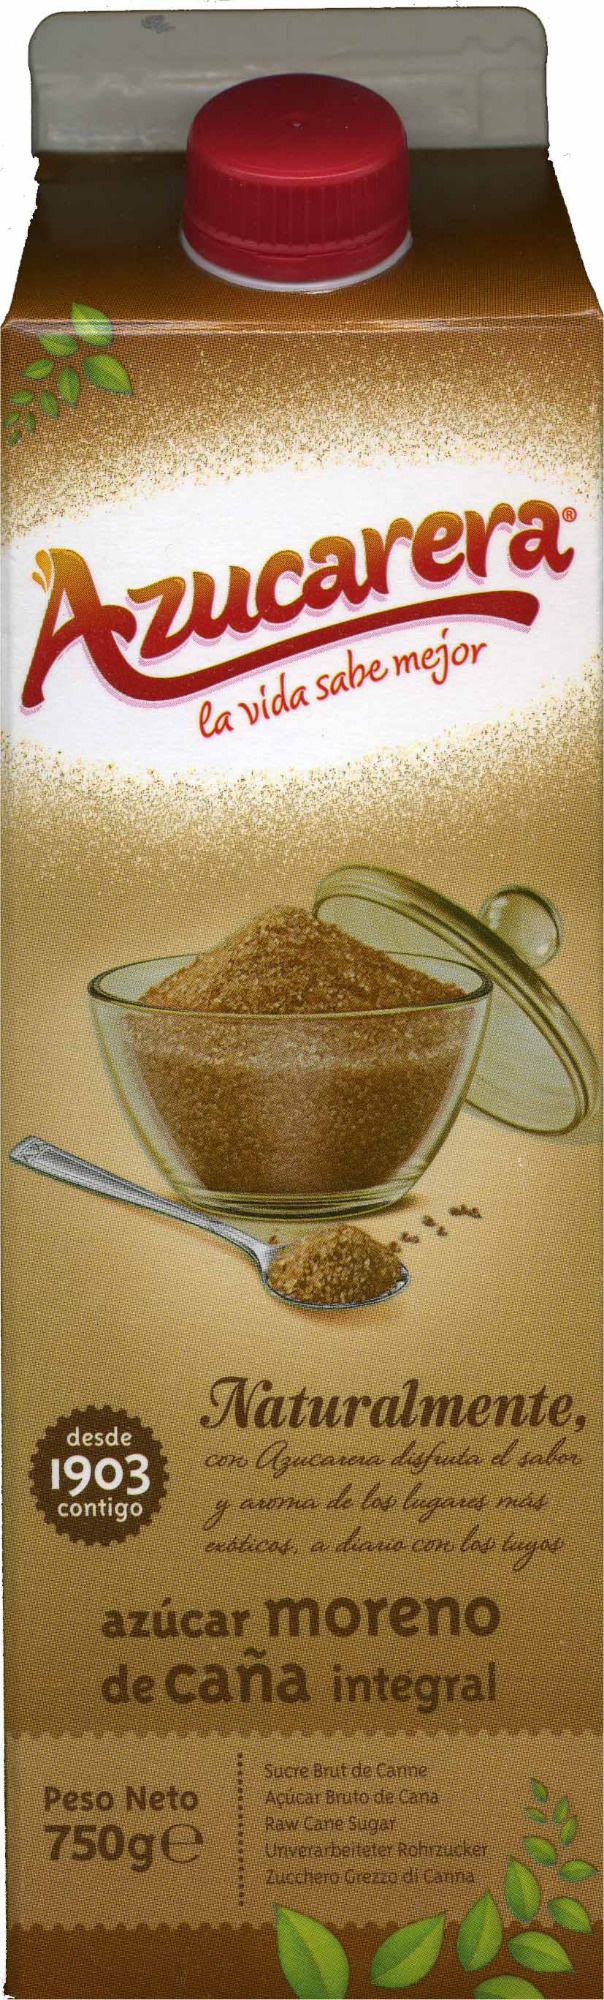 Azúcar moreno de caña integral - Producto - es